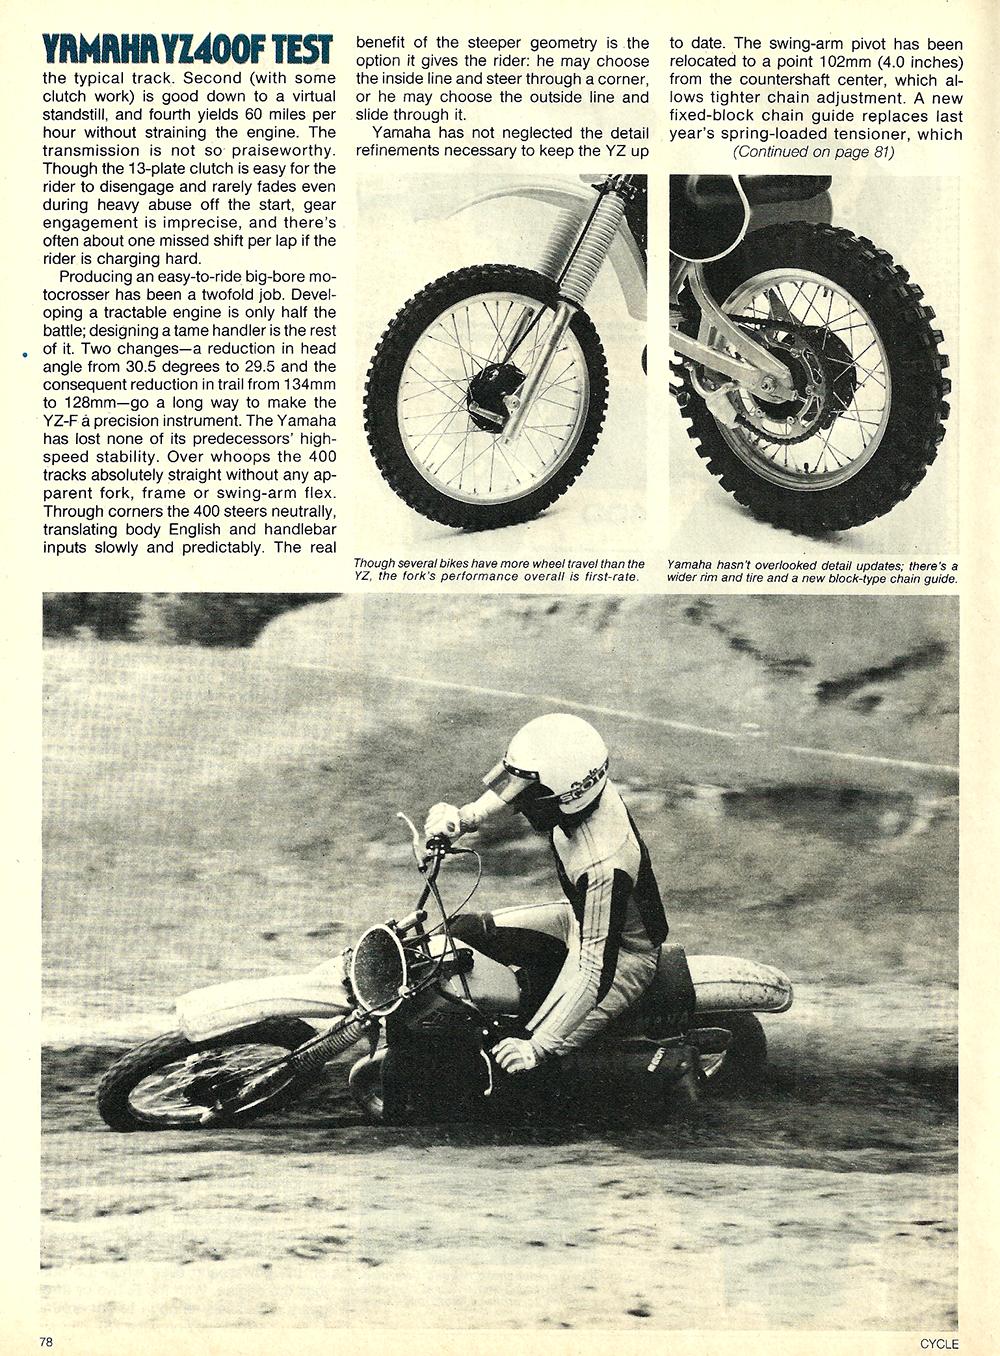 1979_Yamaha_YZ400F_test_pg5.png